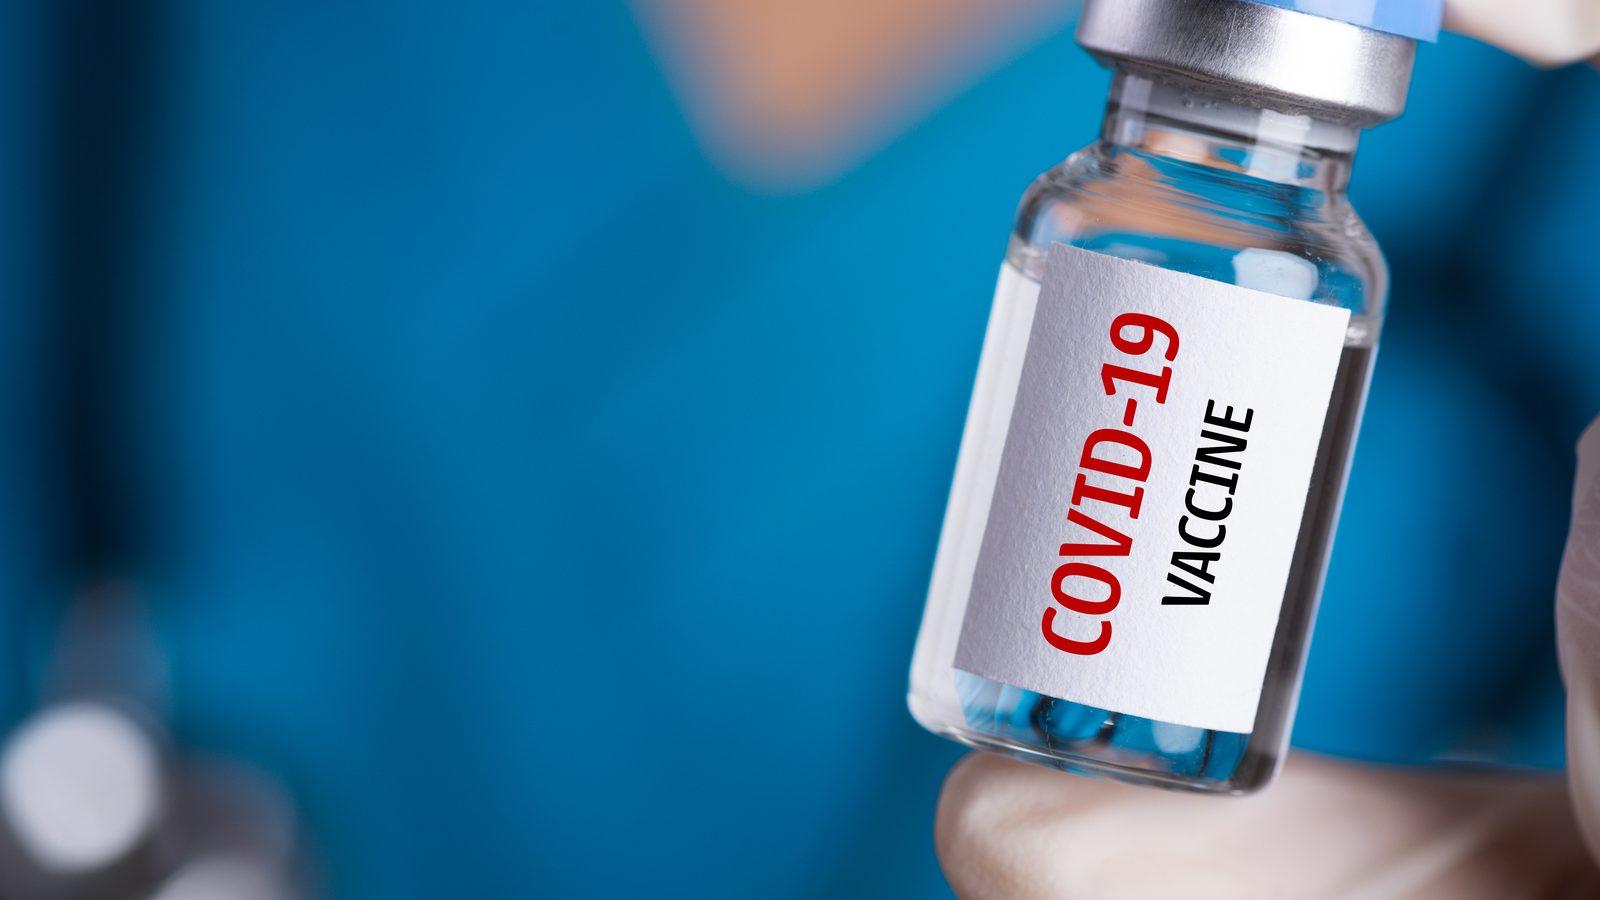 COVID Vaccine Nepal: Where is the effort to produce coronavirus vaccine in Nepal?